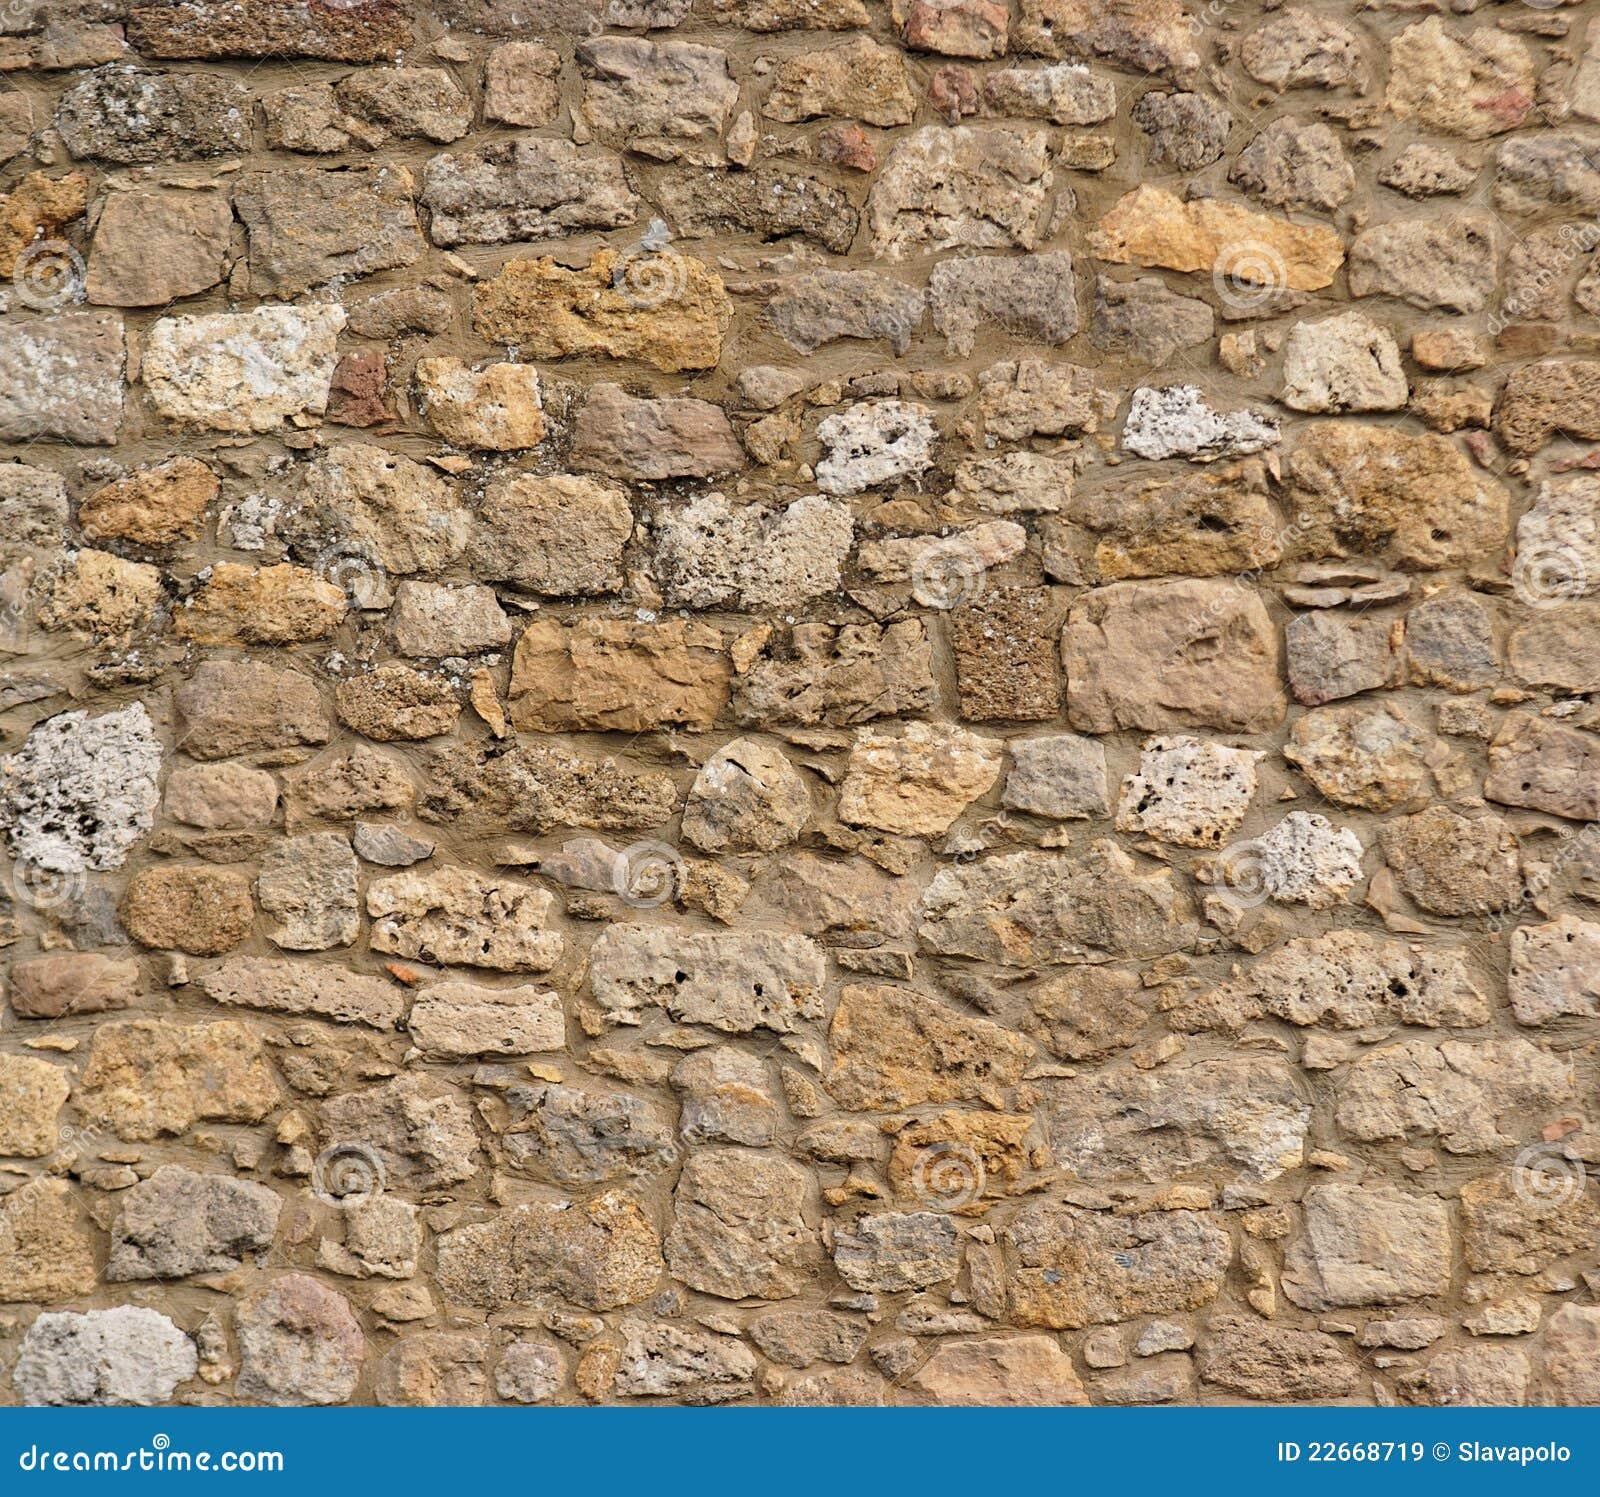 Ancient Stone Wall : Ancient stone wall texture stock image of masonry